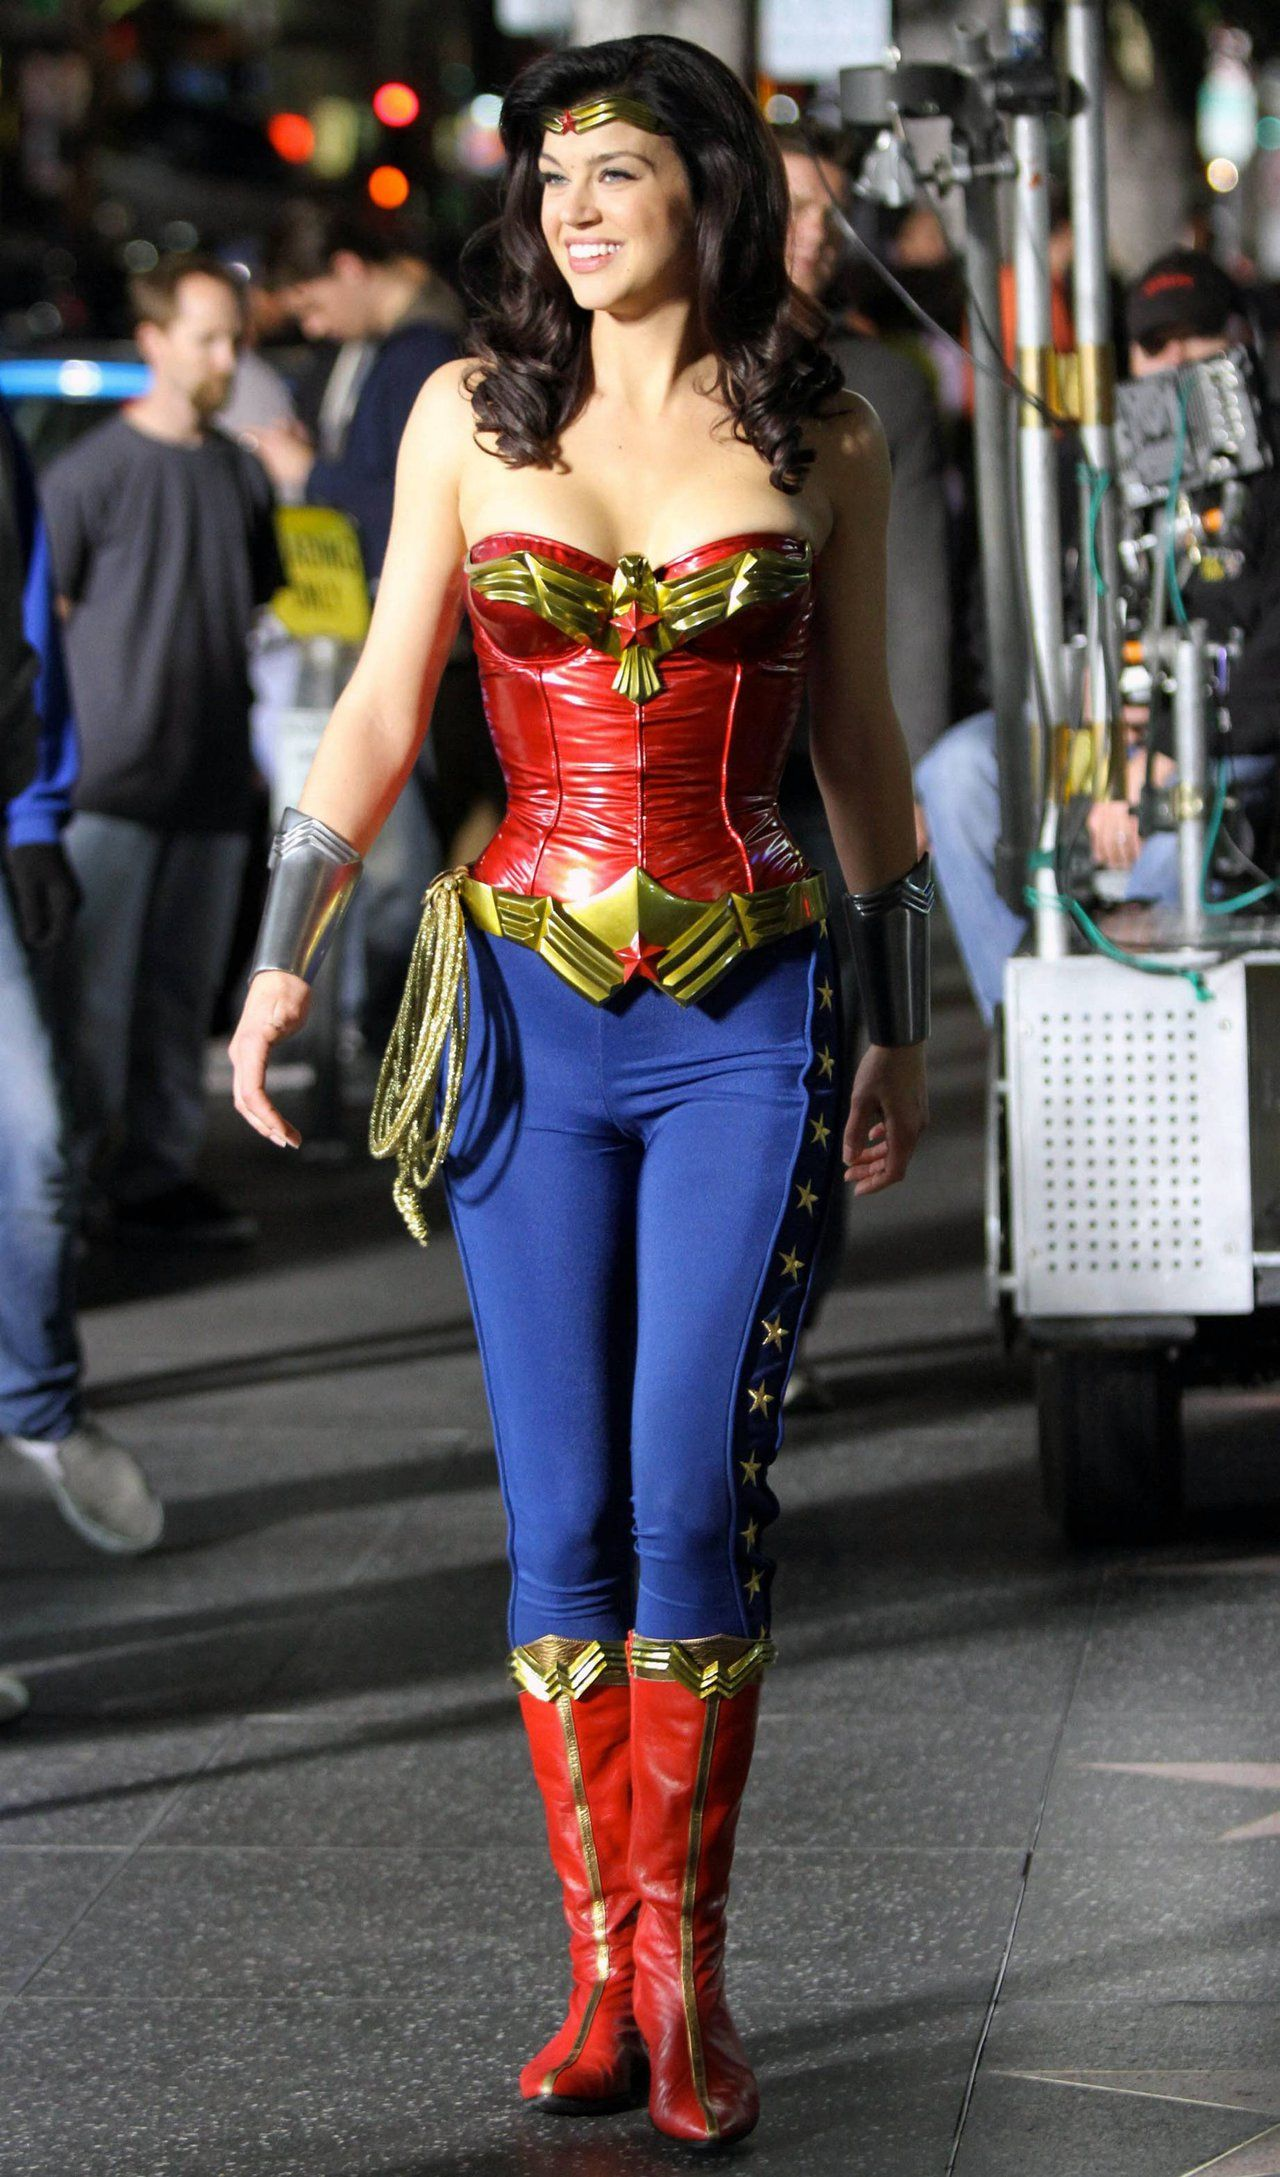 Adrianne palicki wonder woman costume